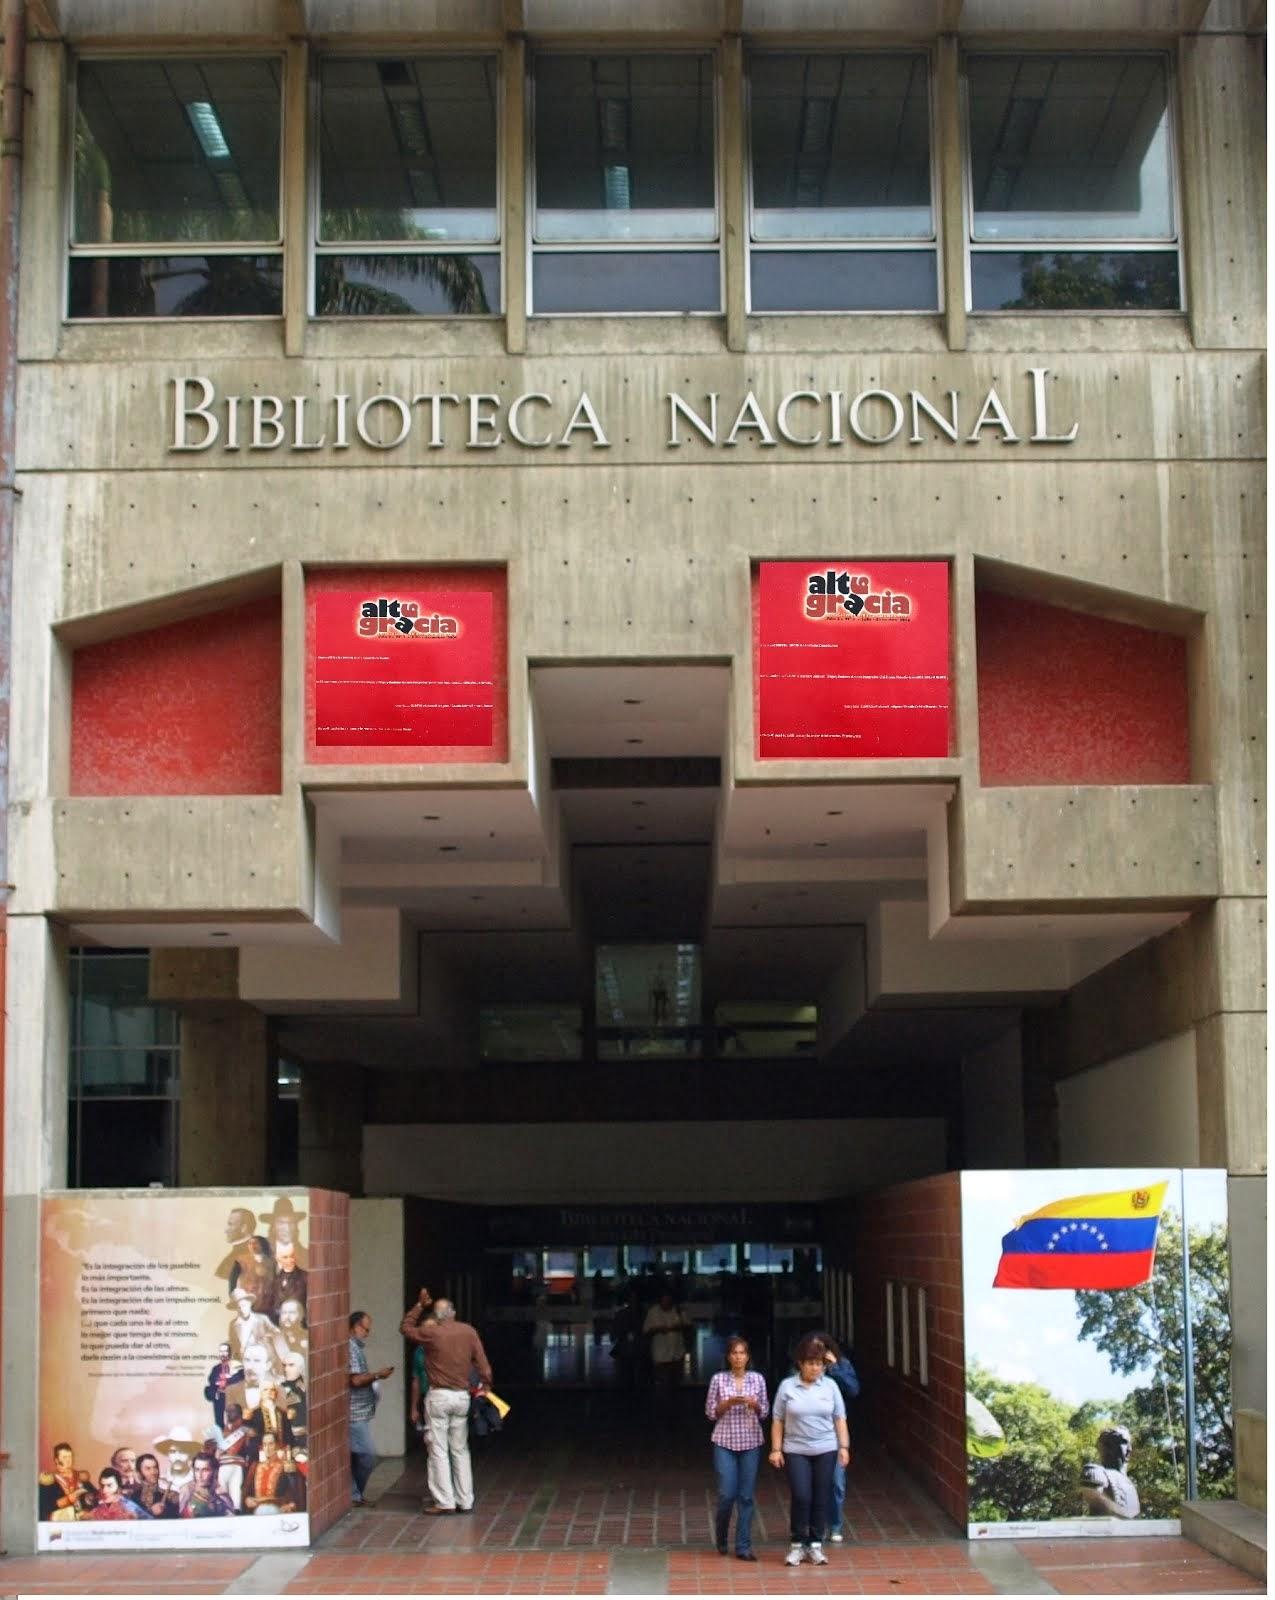 Altagracia revista cultural de la Biblioteca Nacional